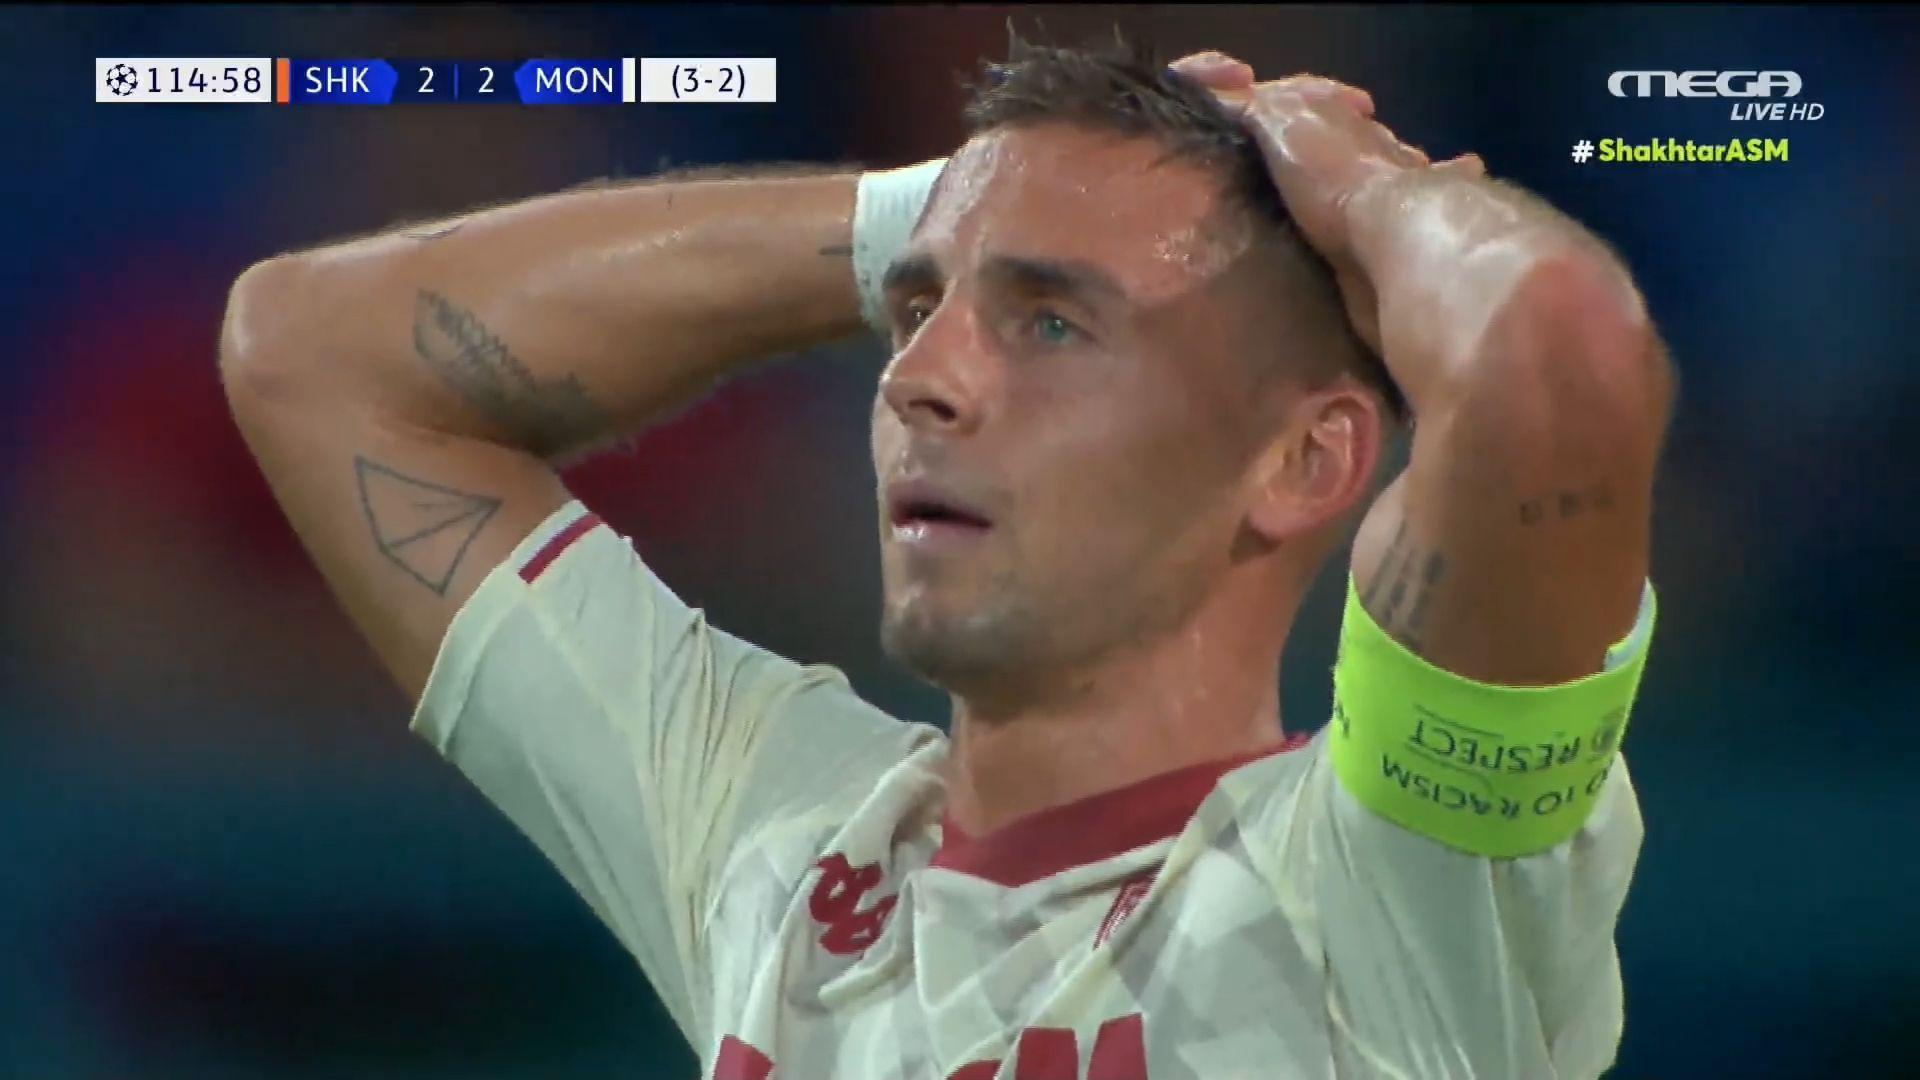 Champions League: Ασύλληπτο αυτογκόλ απέκλεισε την Μονακό κι έστειλε την Σαχτάρ στους ομίλους